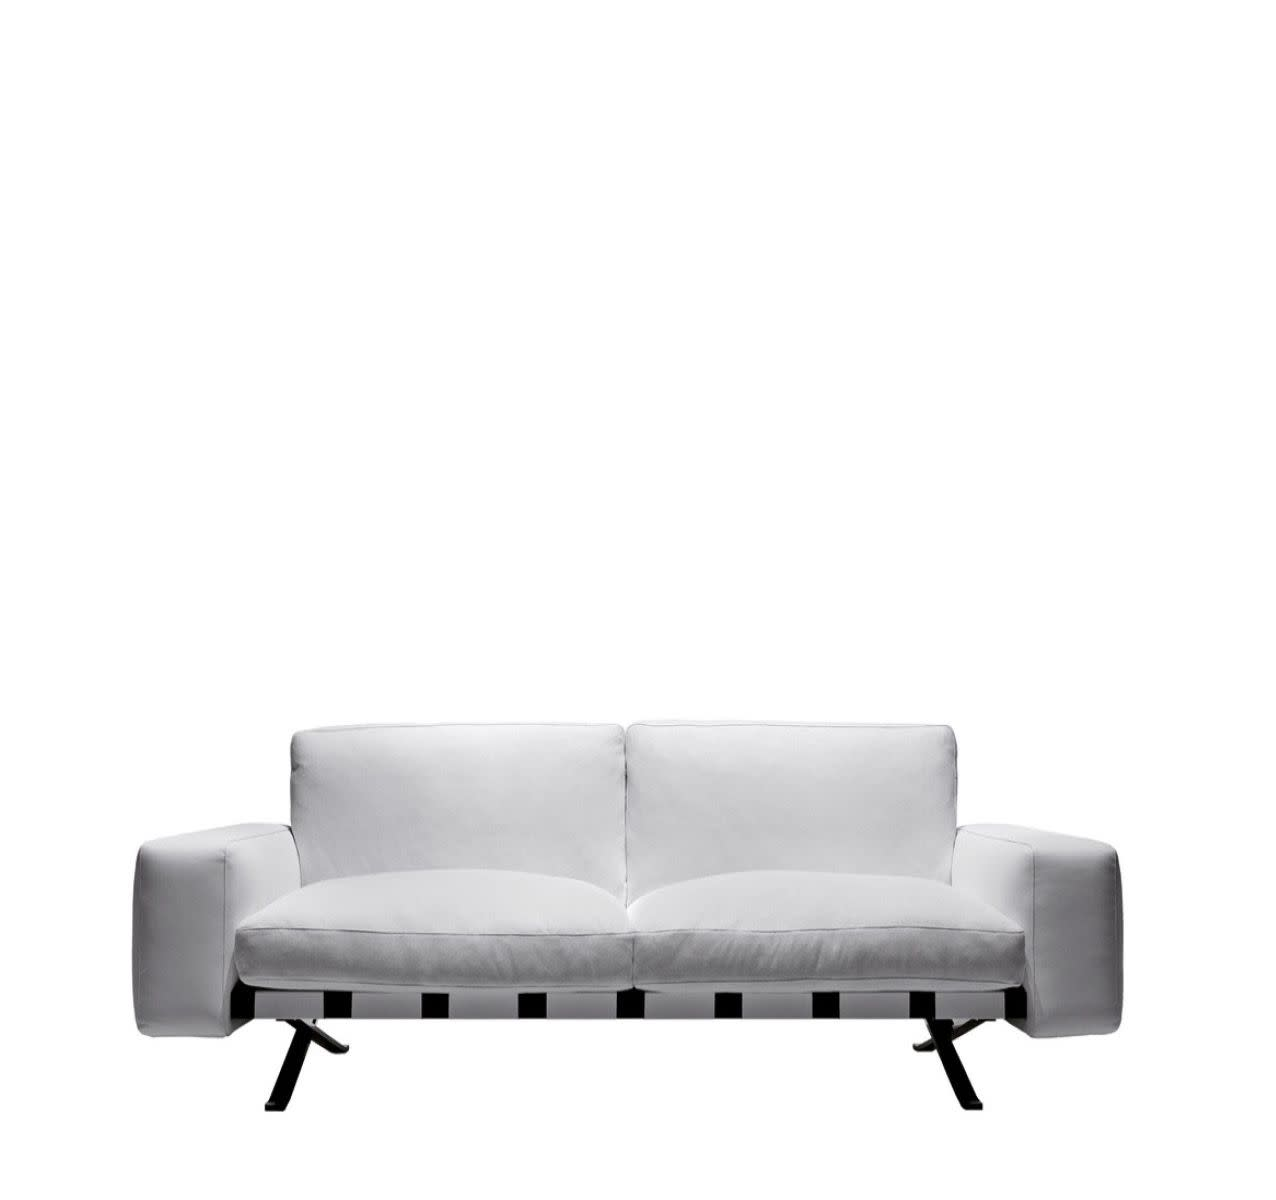 Fenix 2 - Two-Seater Sofa Colorado - Arancio 307, Cairo - Bianco 01